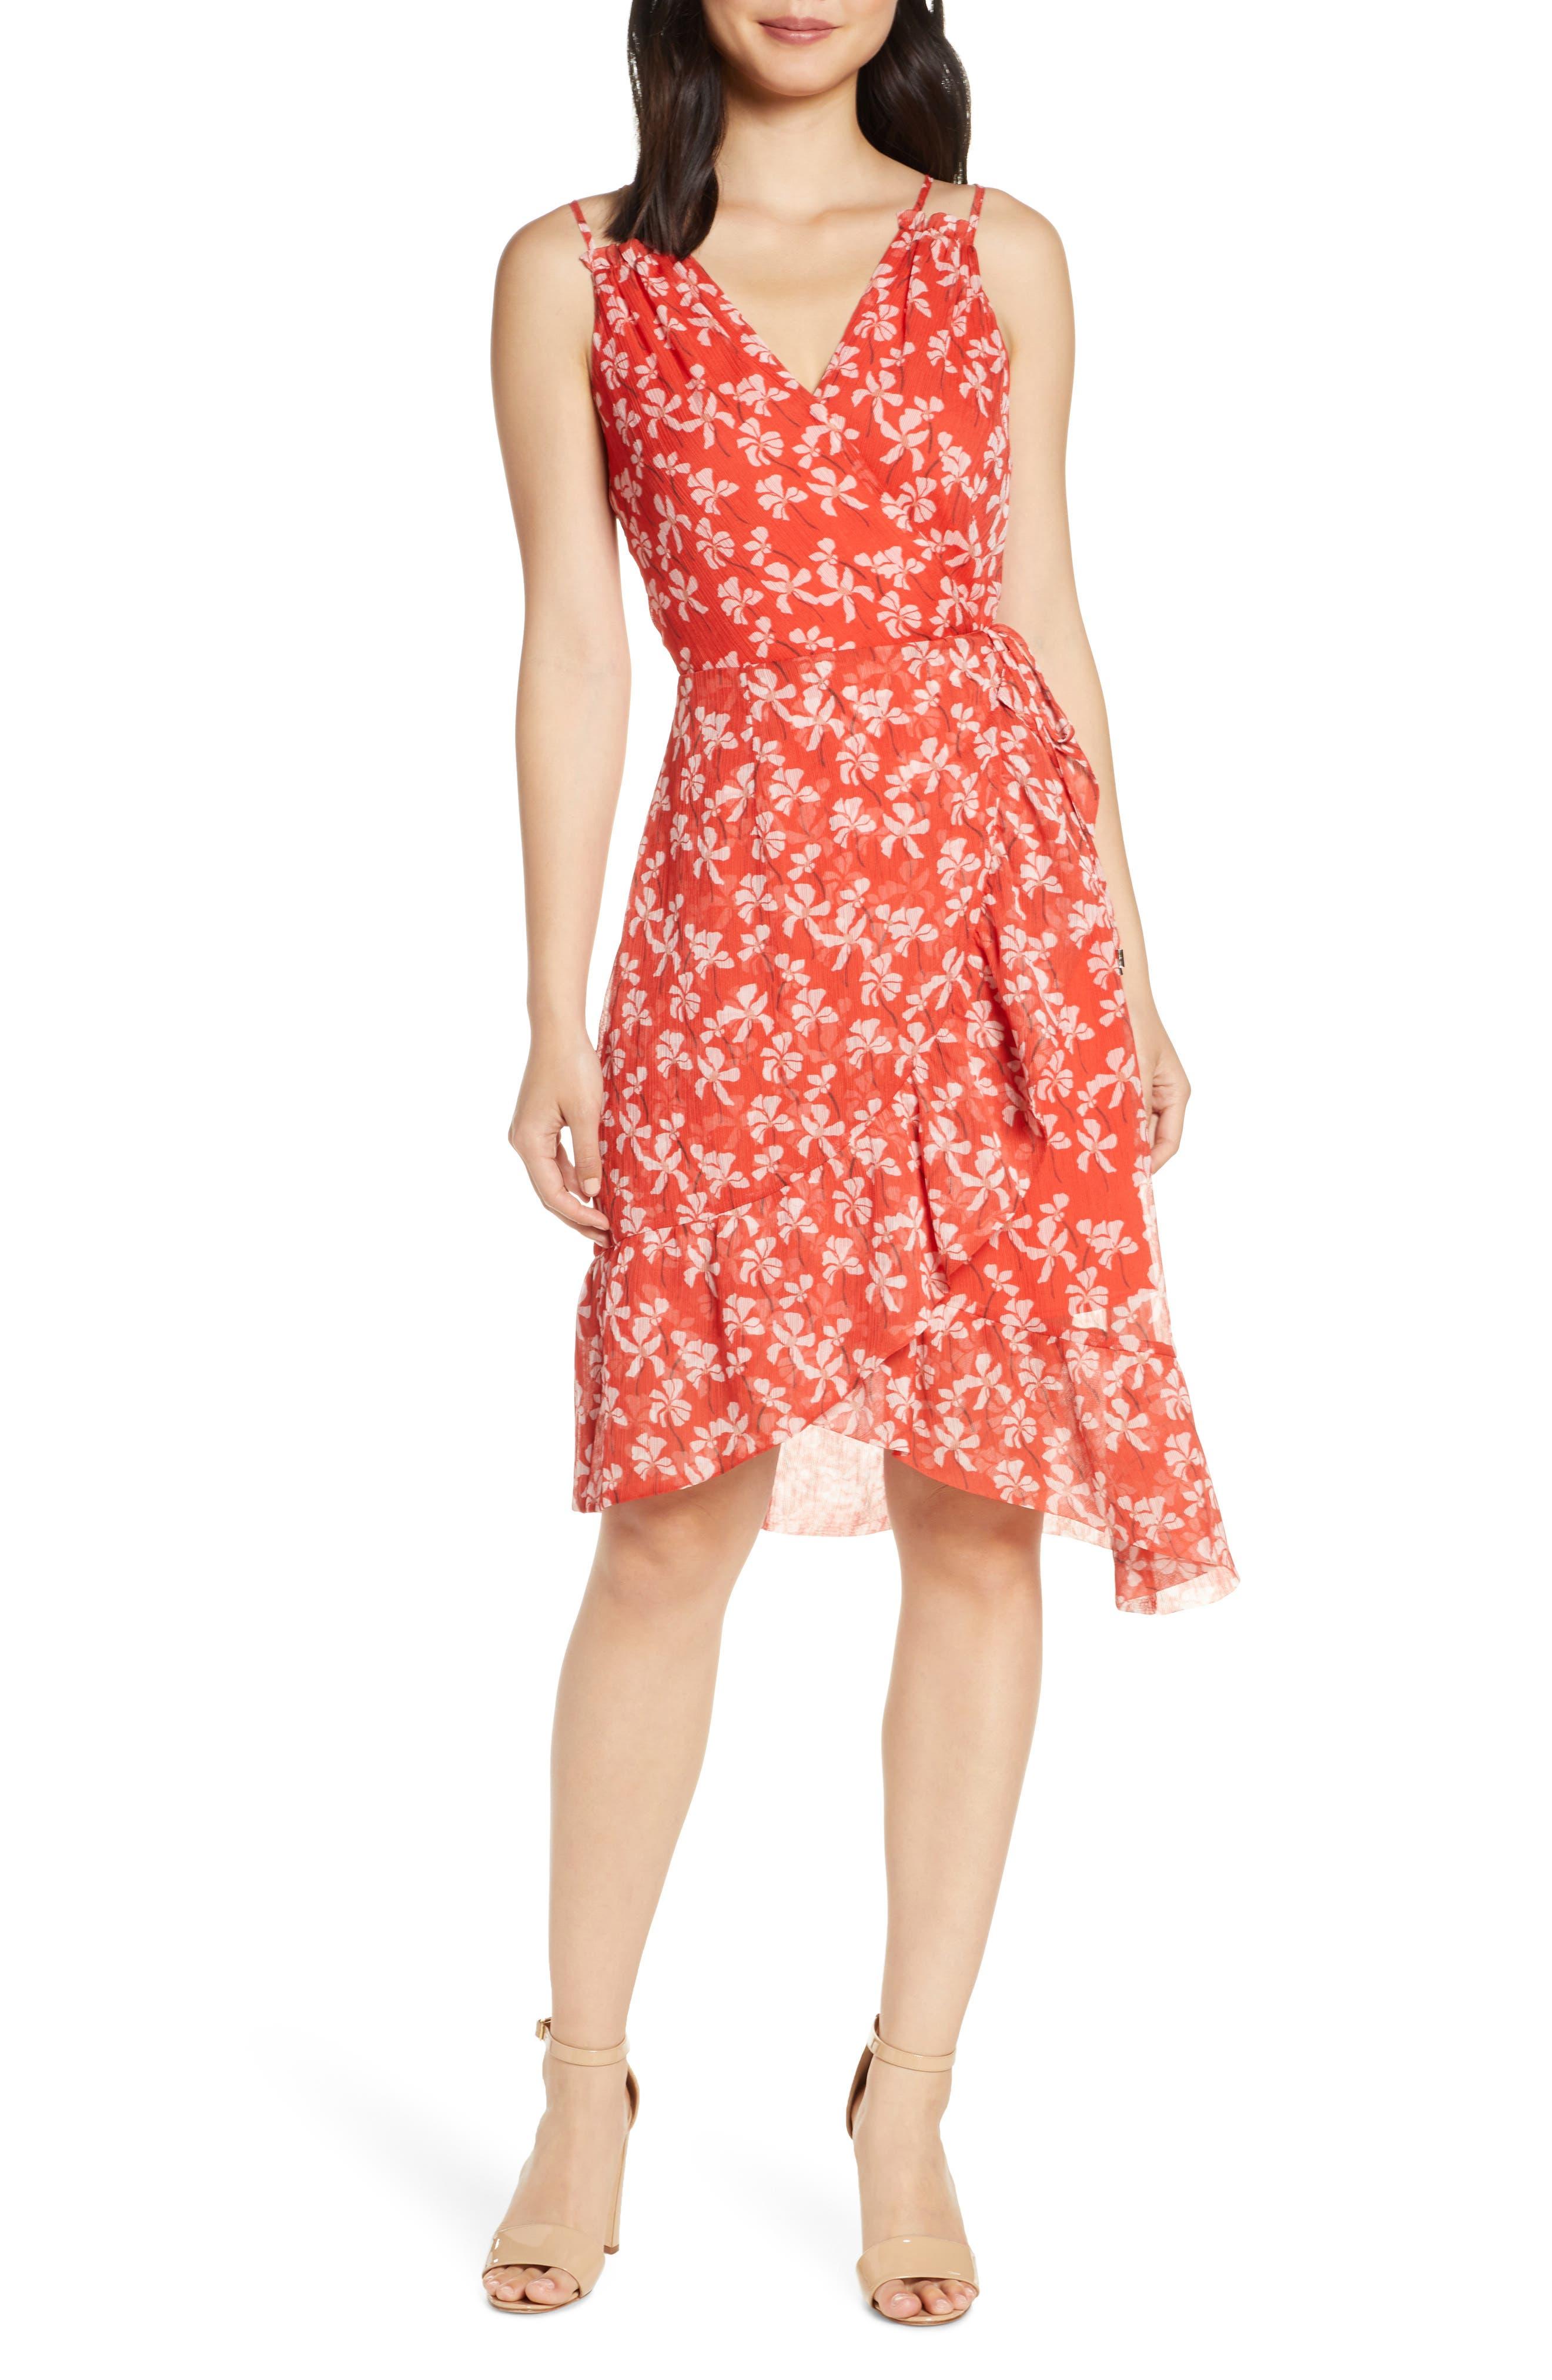 Adelyn Rae Tessie Floral Print Asymmetrical Chiffon Dress, Red